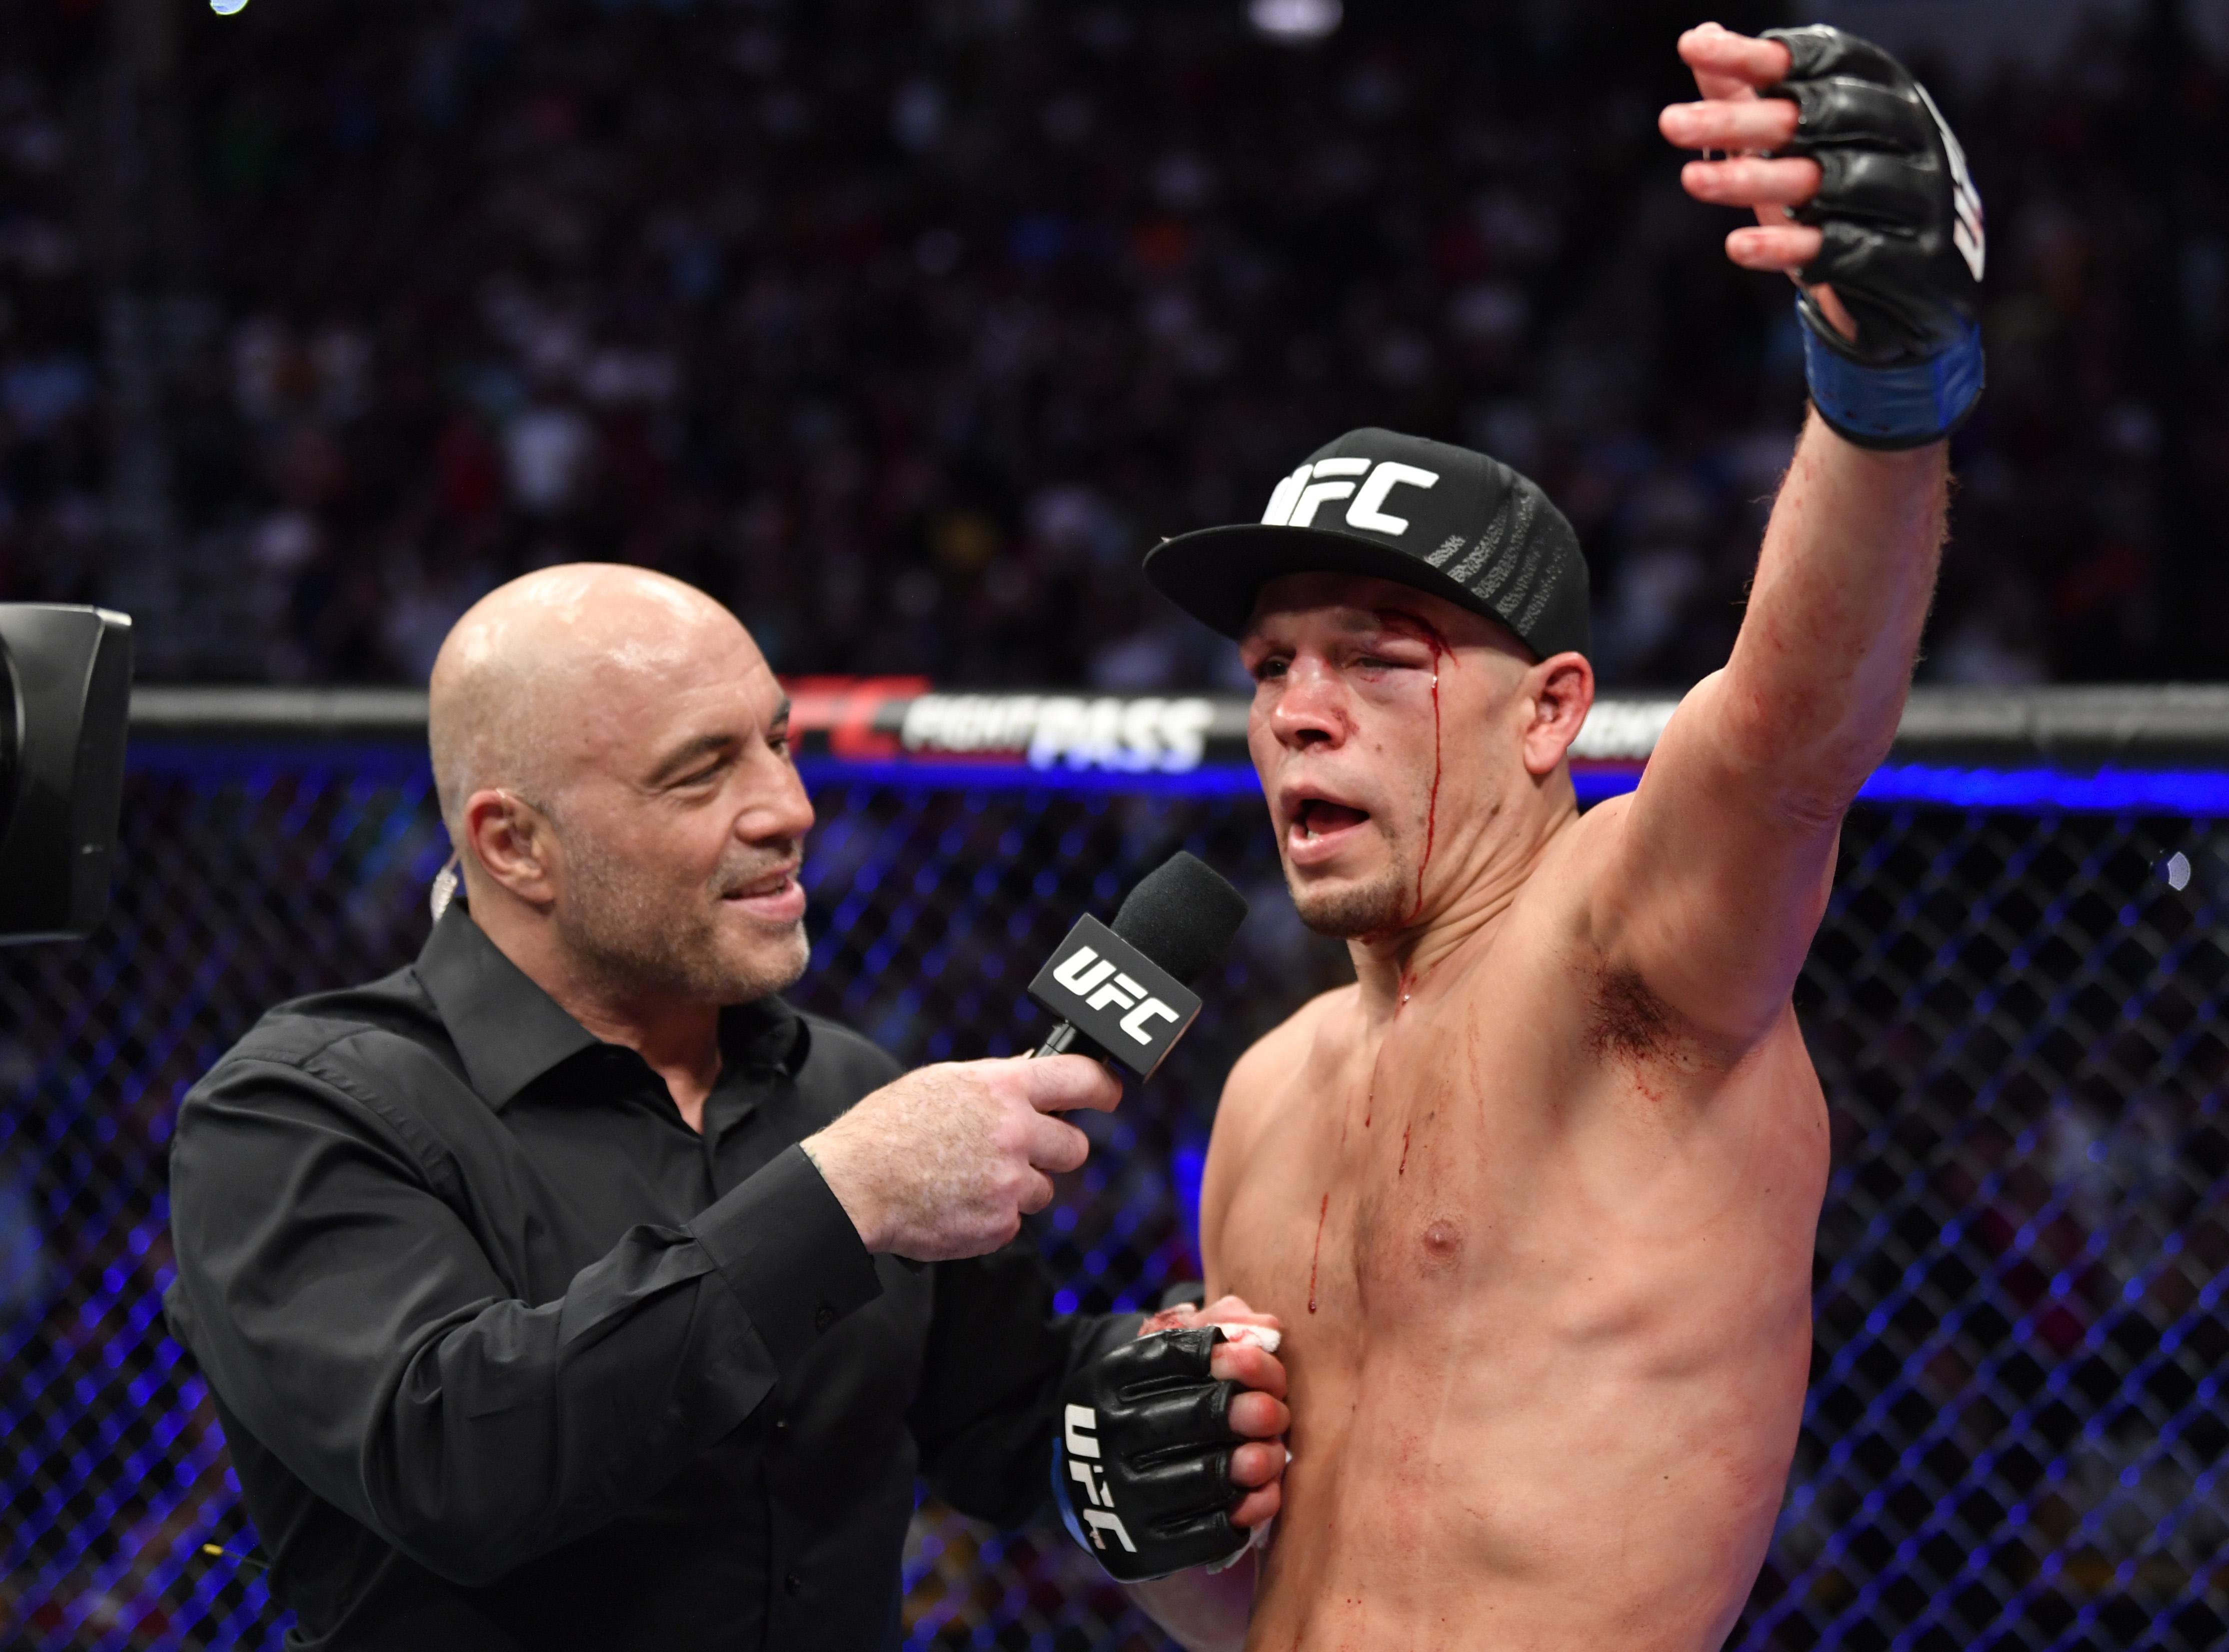 UFC 263: Leon Edwards vs. Nate Diaz